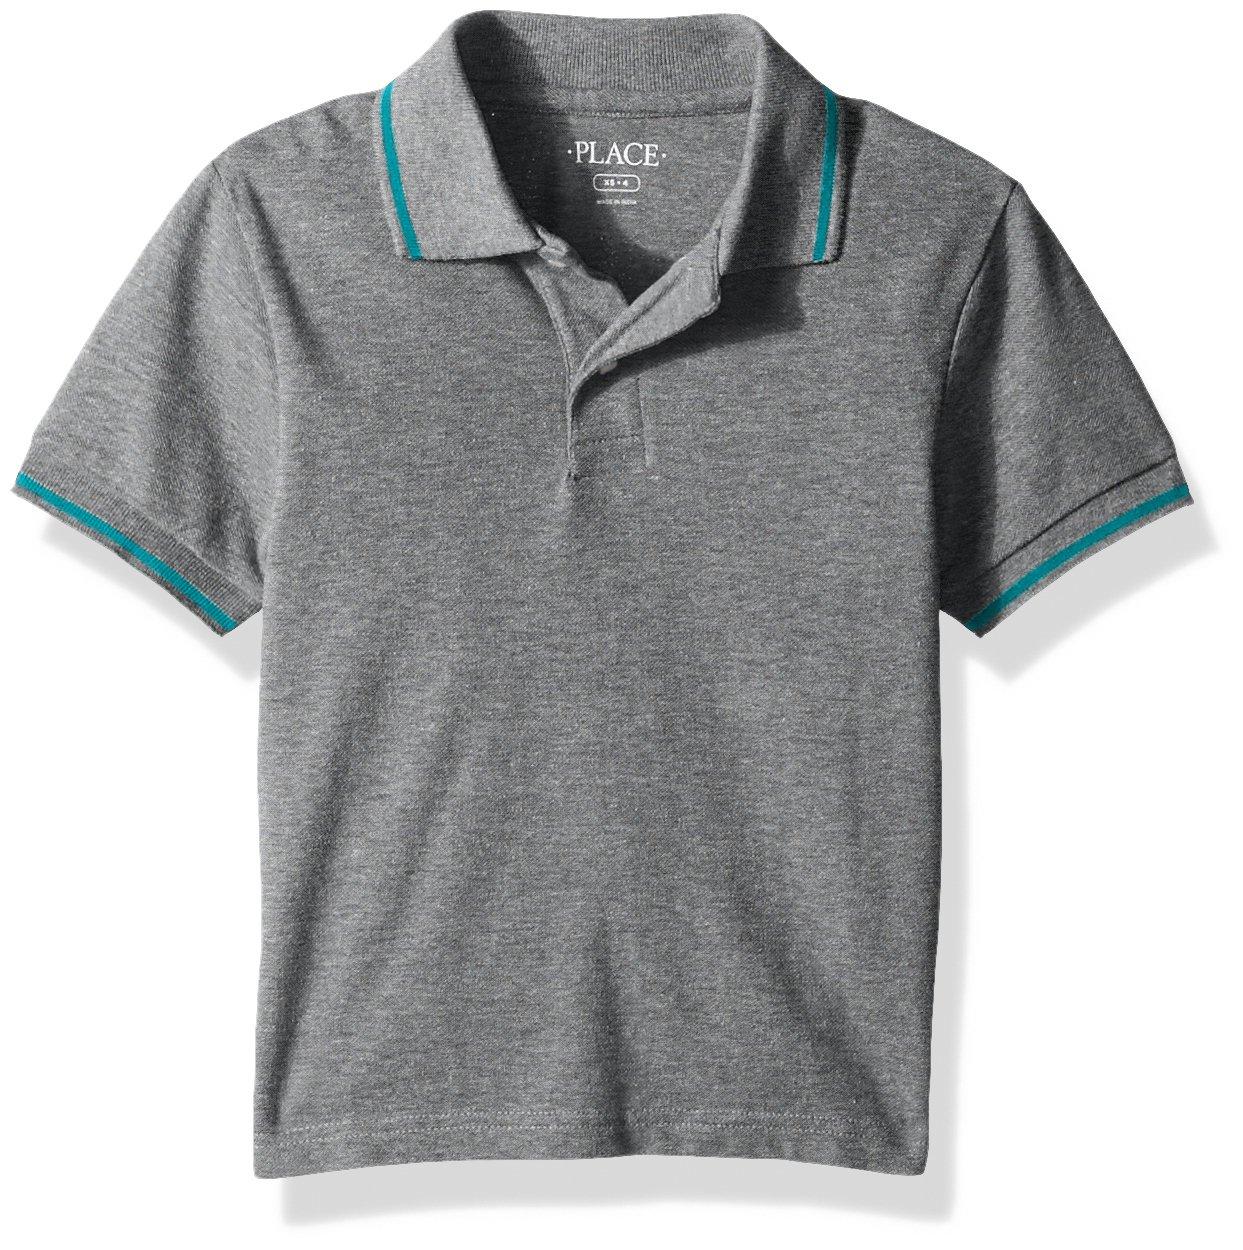 The Children's Place Boys Big Boys Short Sleeve Polo 2102724